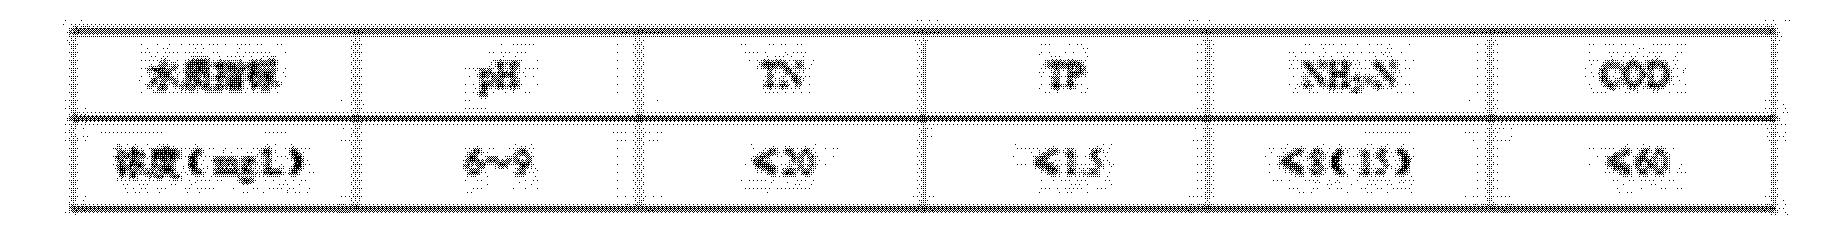 Figure CN203794737UD00081